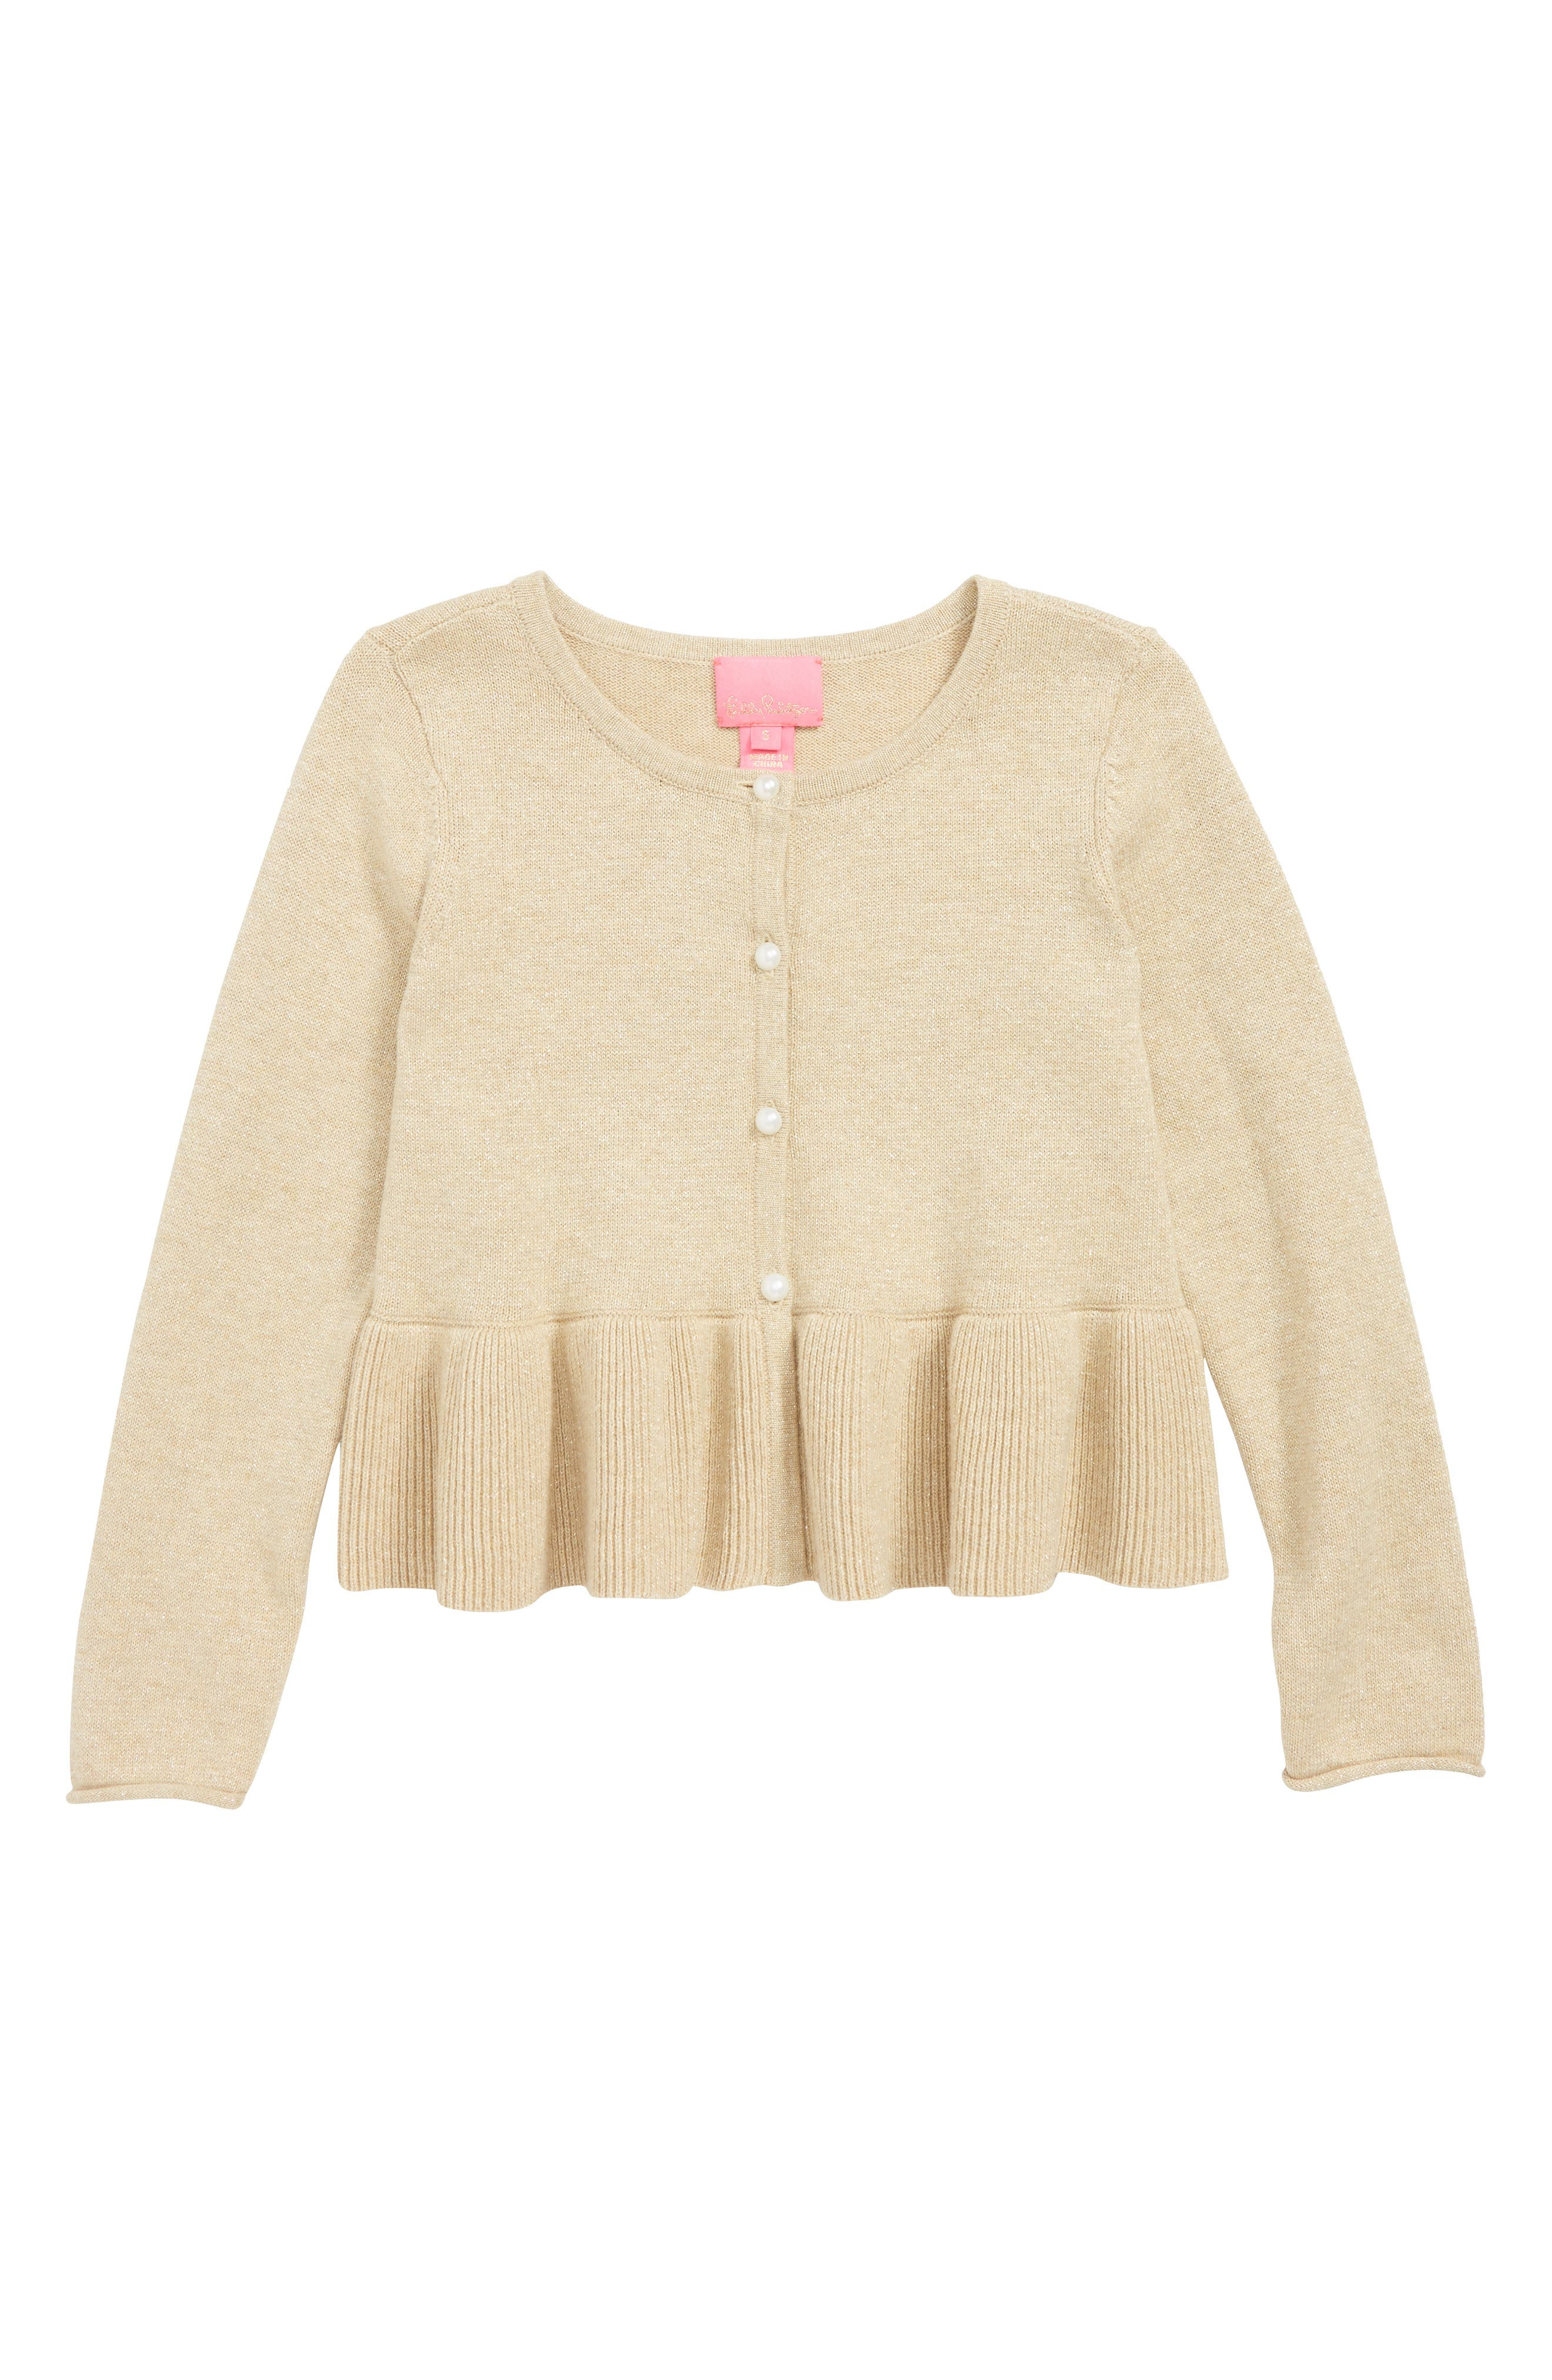 Girls Lilly Pulitzer Adelaide Cardigan Size L (810)  Metallic